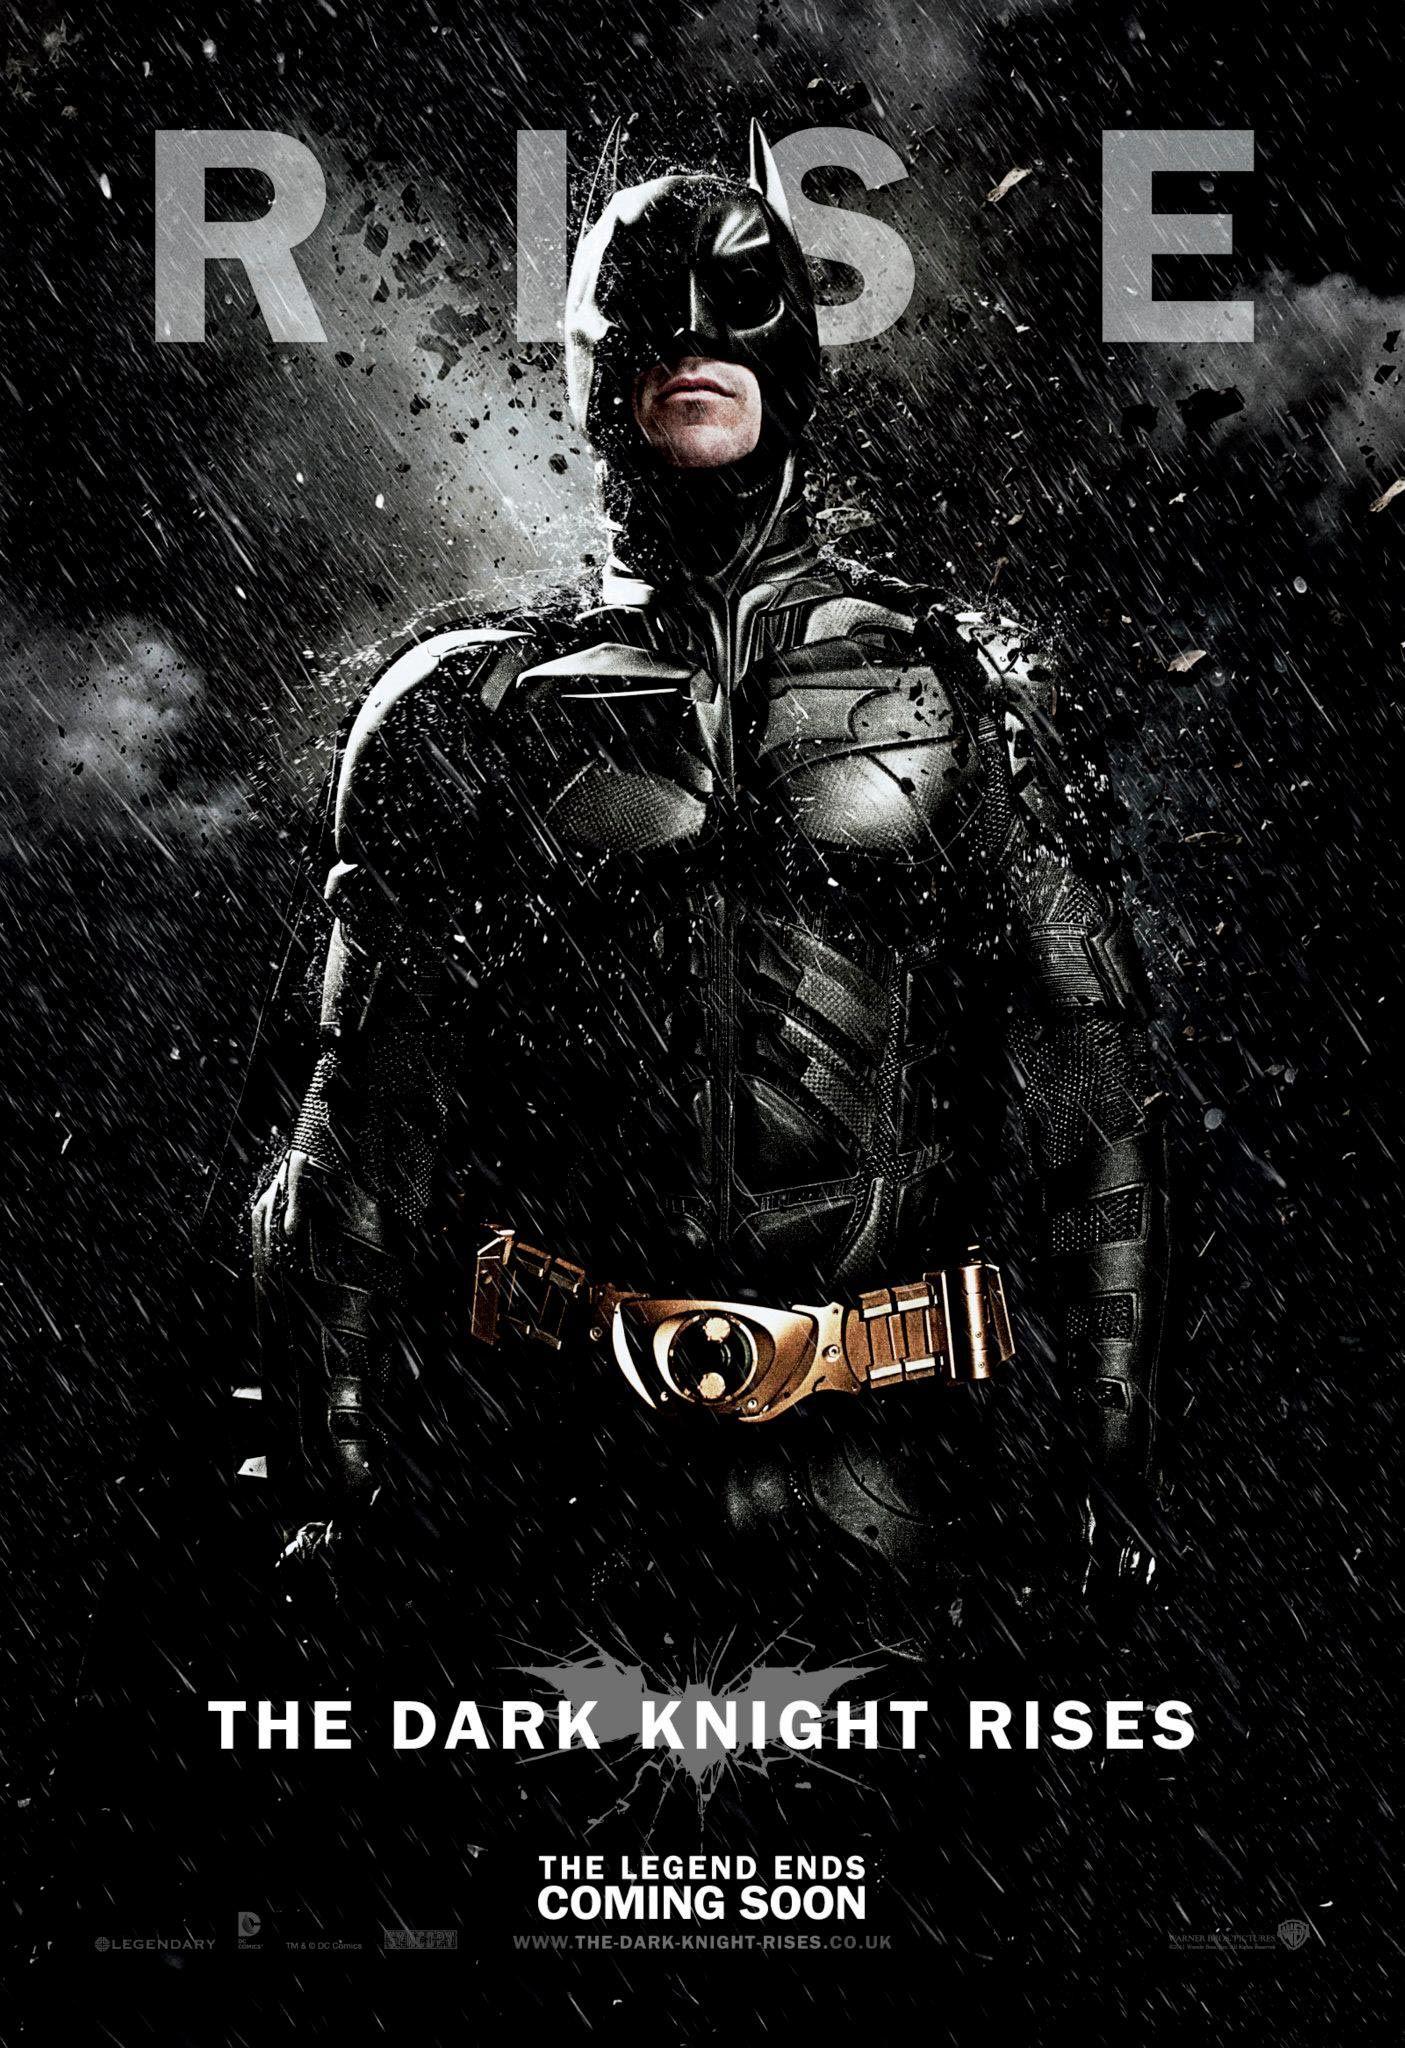 The Dark Knight Rises Poster The Dark Knight Rises The Dark Knight Trilogy Batman The Dark Knight